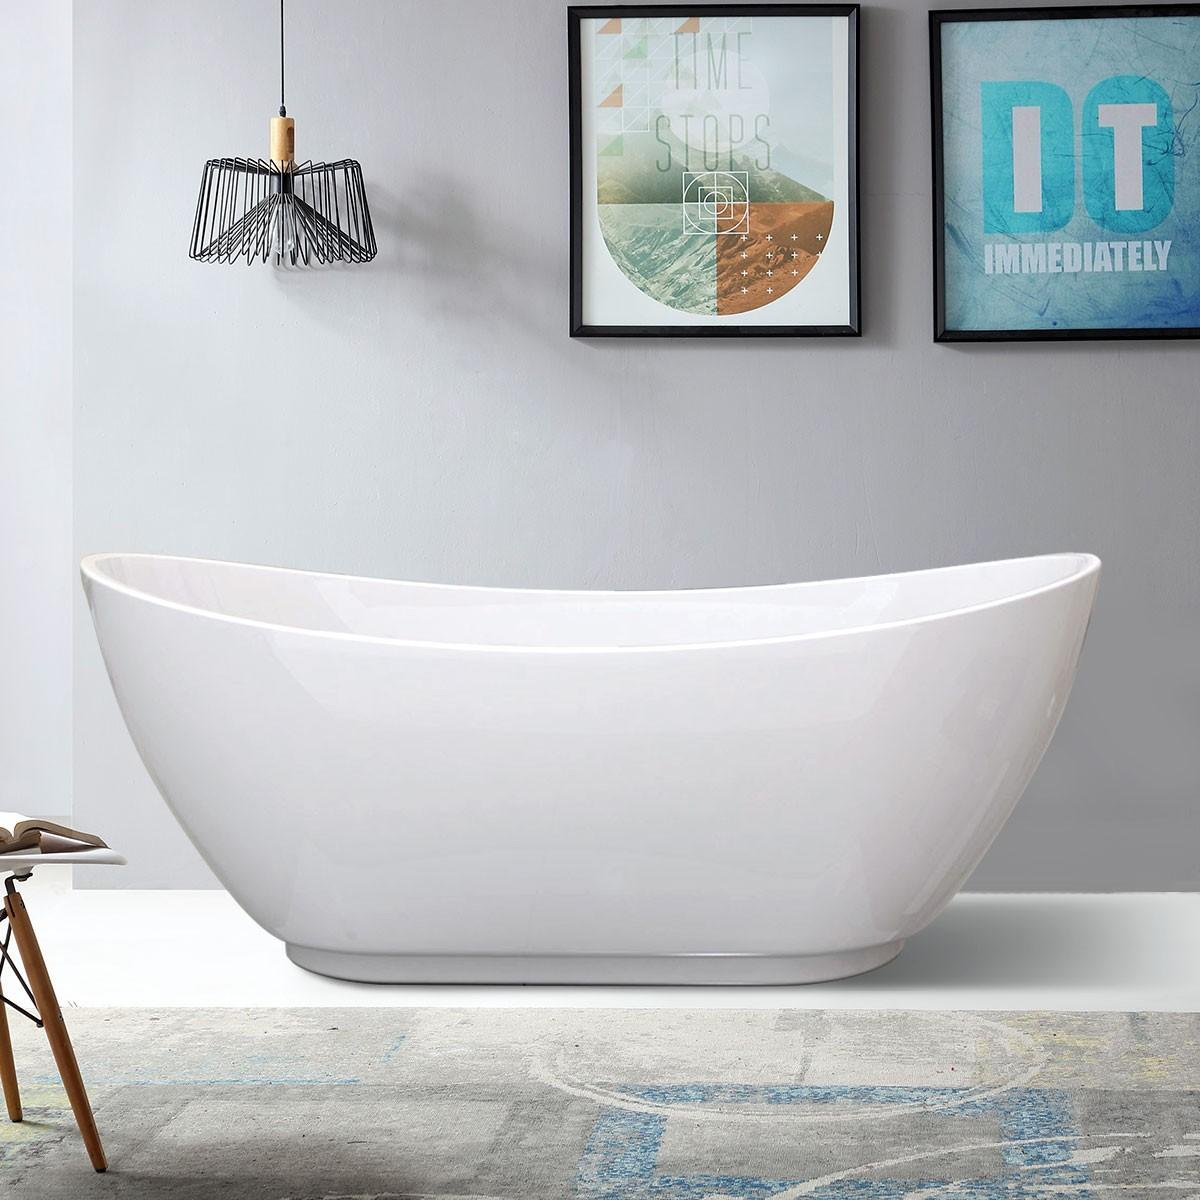 66 In Seamless Freestanding Bathtub - Acrylic Pure White (DK-PW-10774)